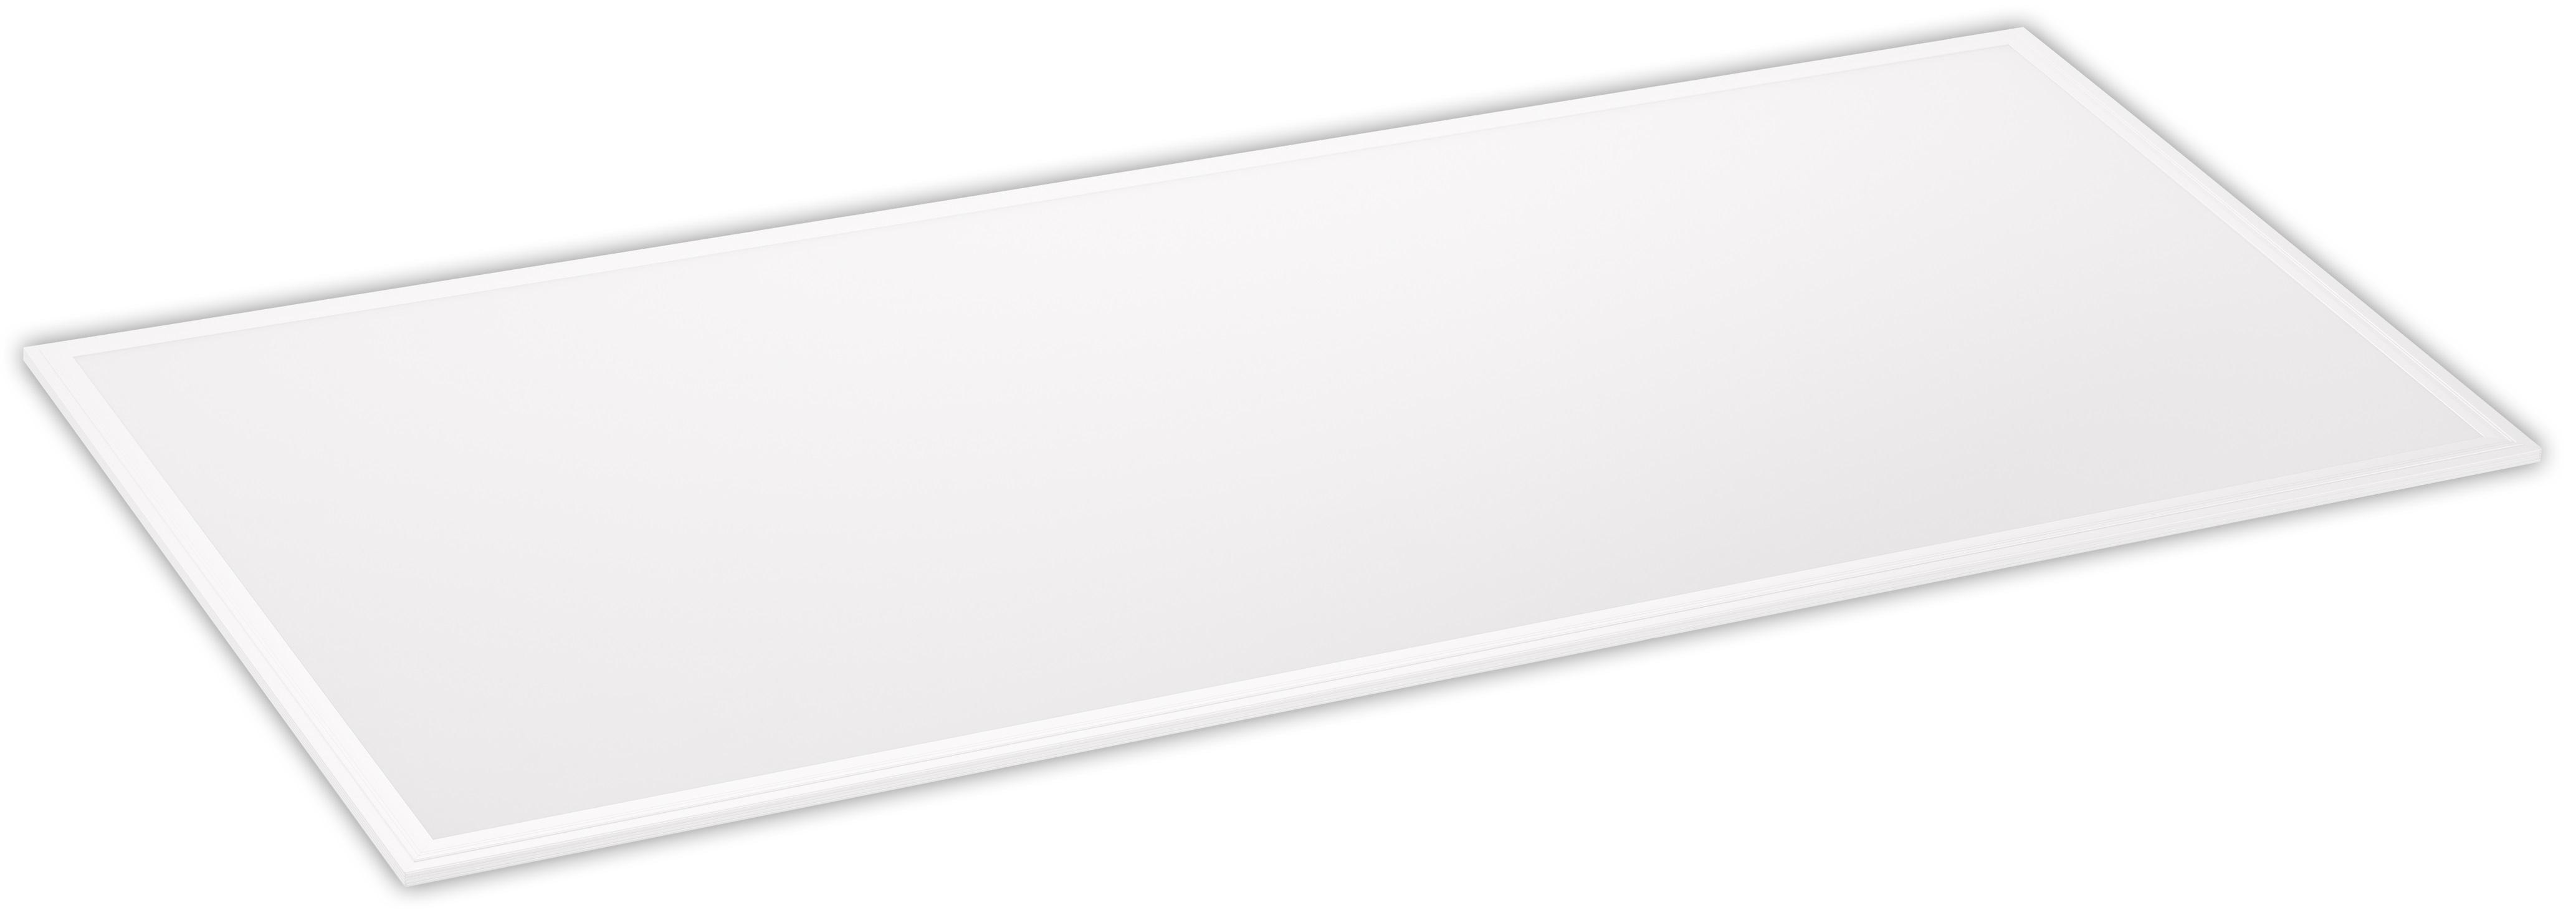 LED Panel 42W, 4000lm, 840, 1197x297mm, 1050mA, ohne Treiber